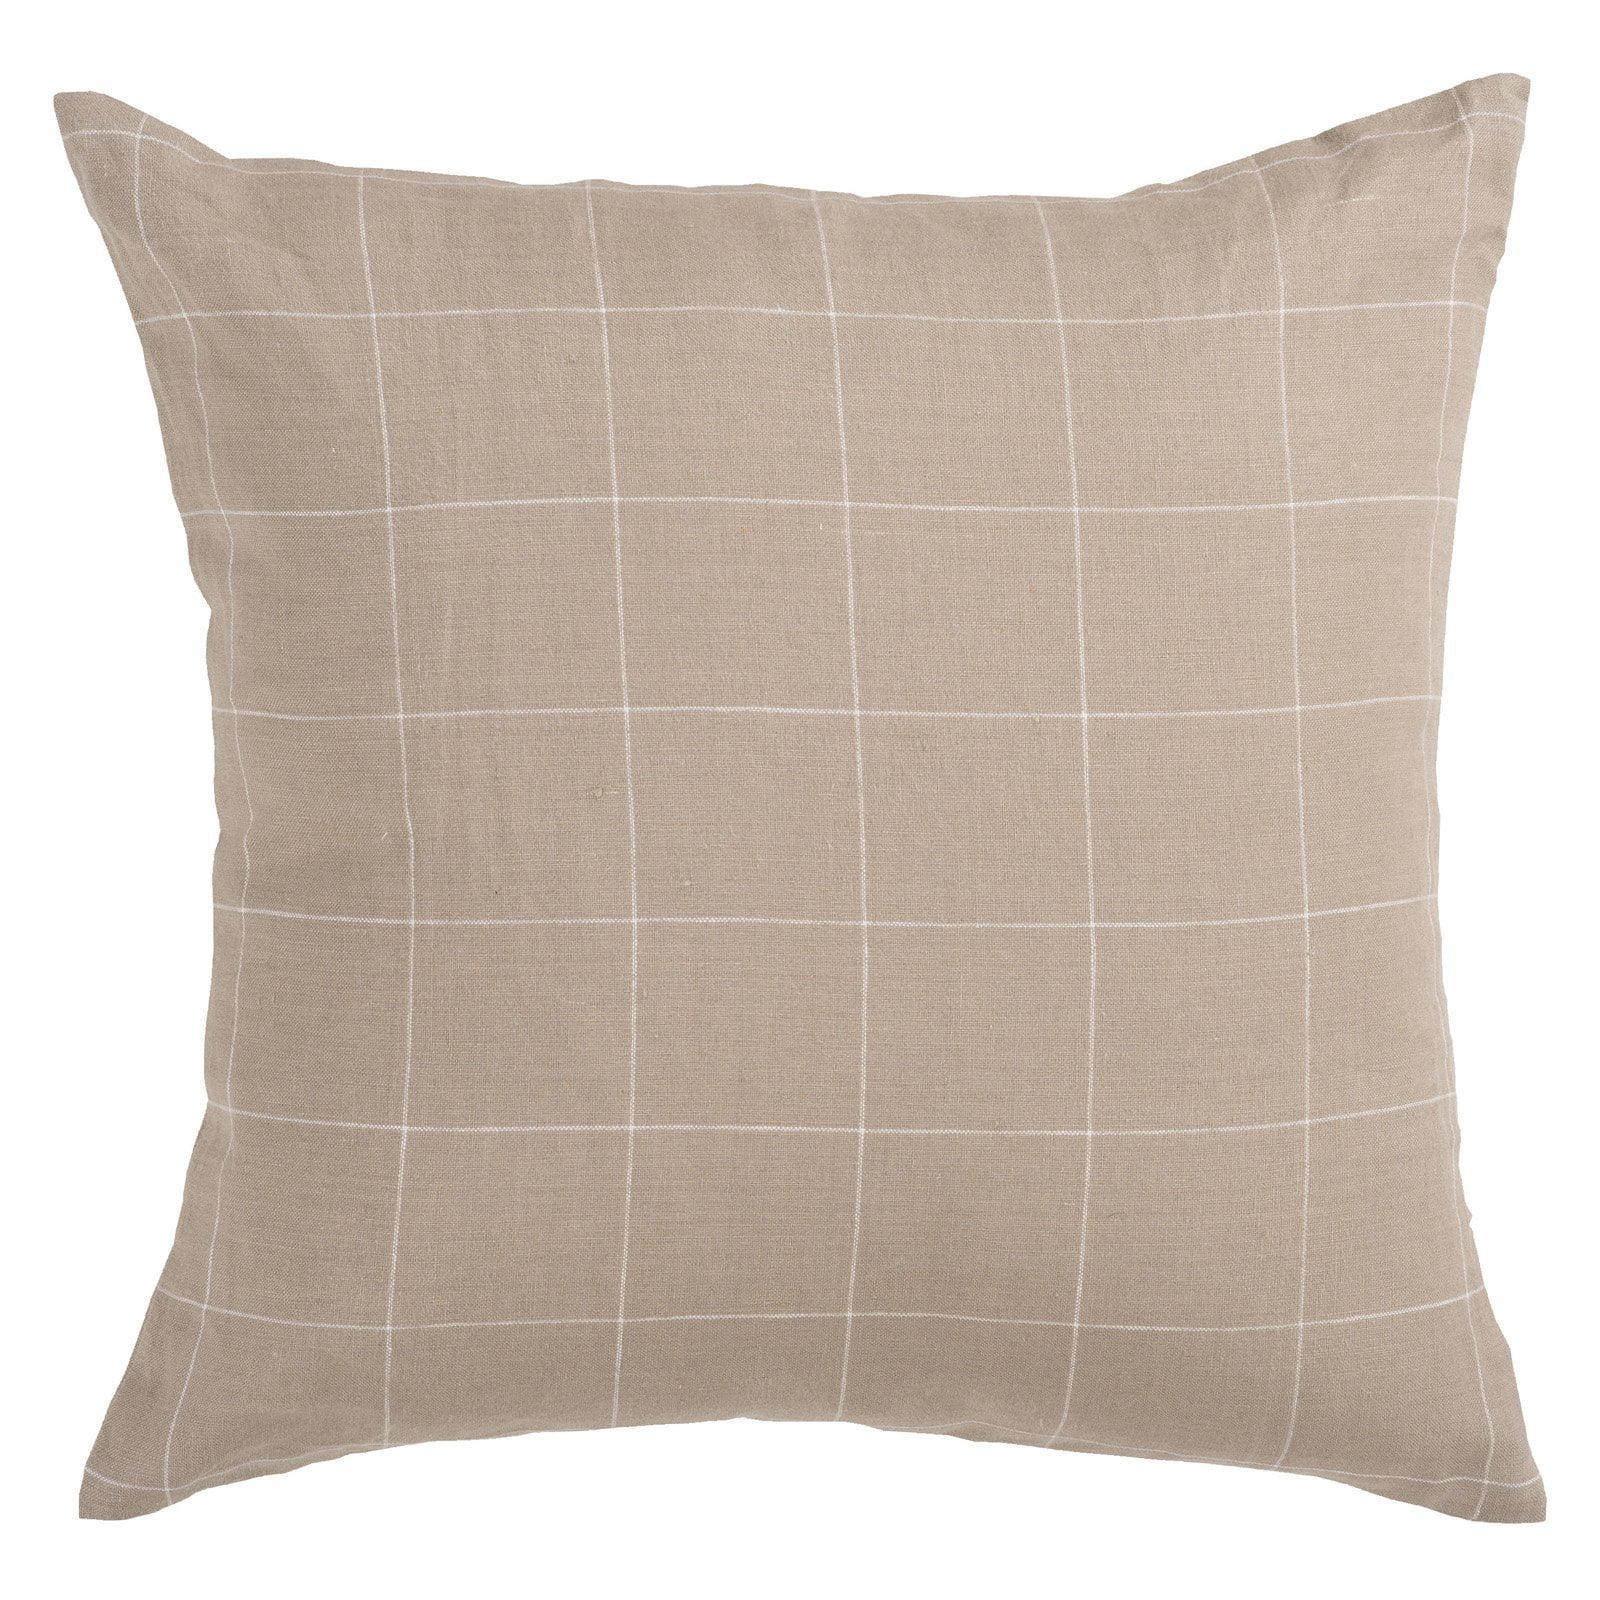 Surya Windowpane Decorative Pillow - Beige